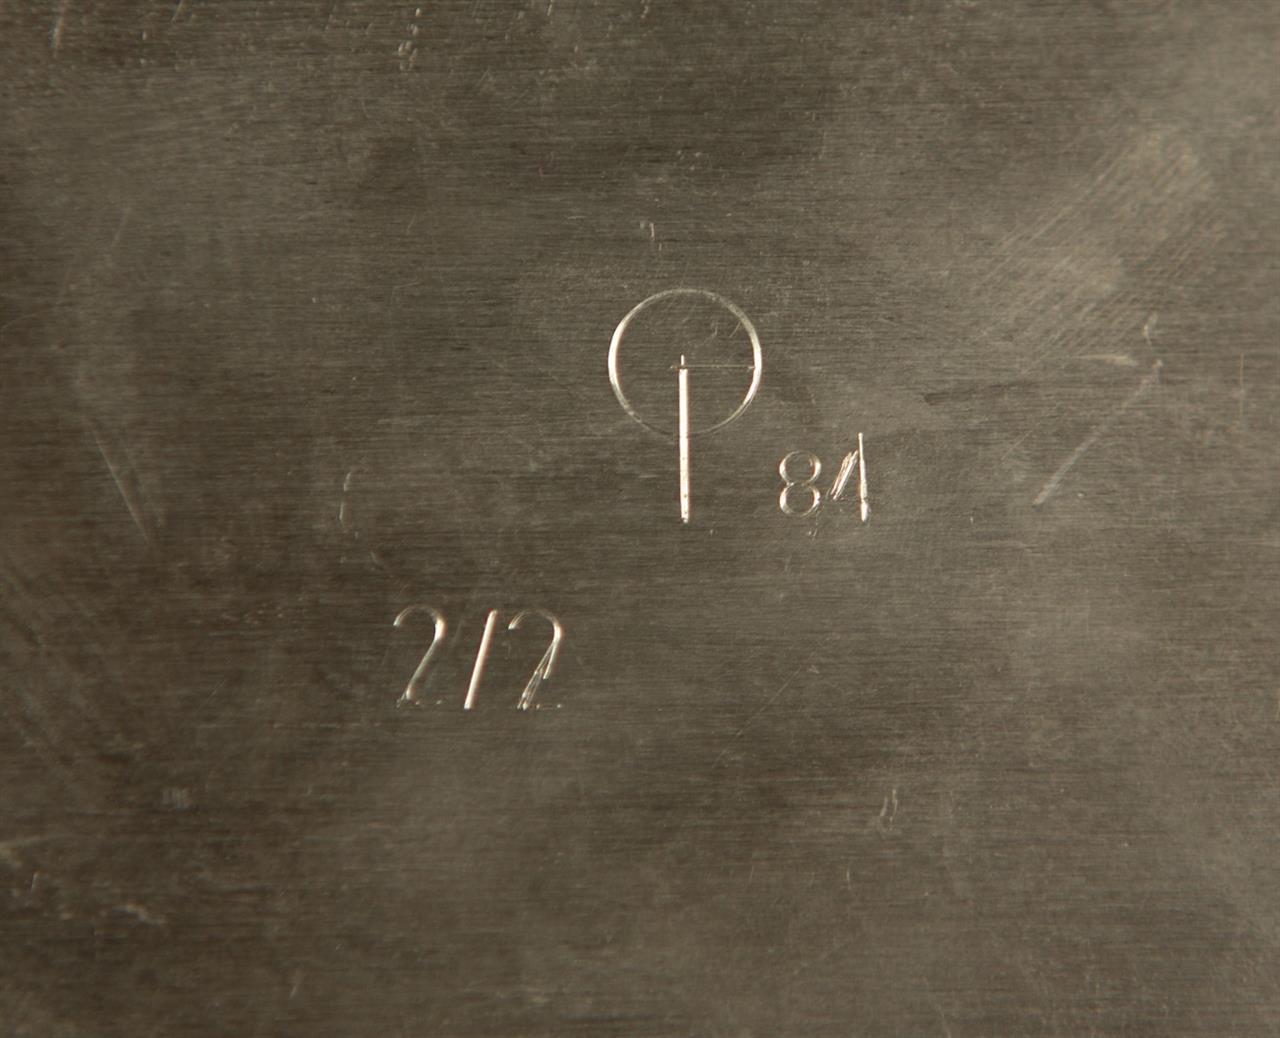 Victor Bonato. Ohne Titel (Bleikreuz). 1981/84 (?). Glasierte Keramik, Blei, Metallplatte. Nummeriert 2/2.